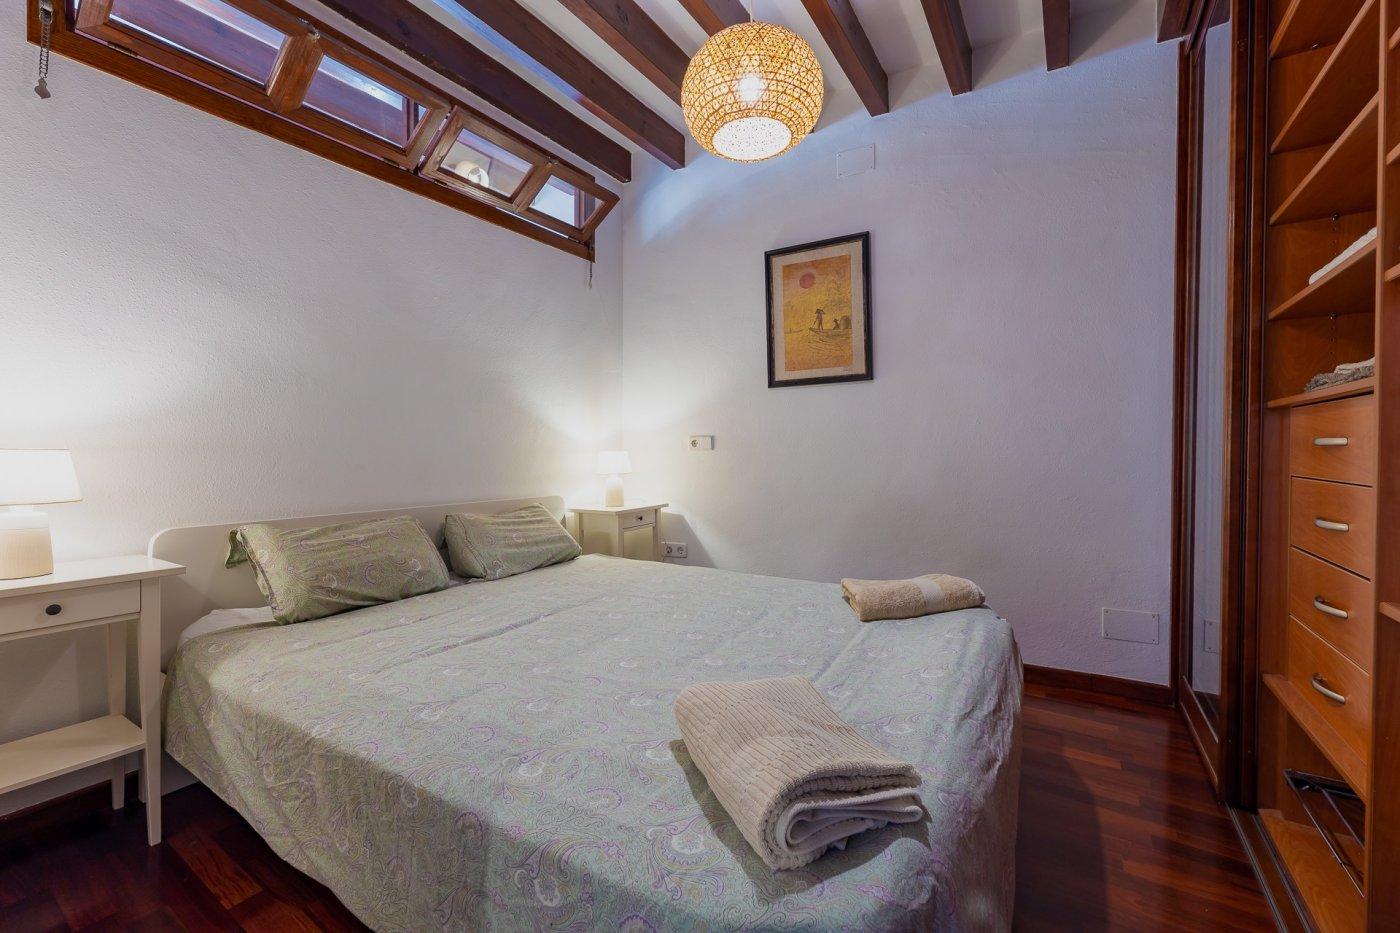 Espectacular apartamento en centro de palma - imagenInmueble10